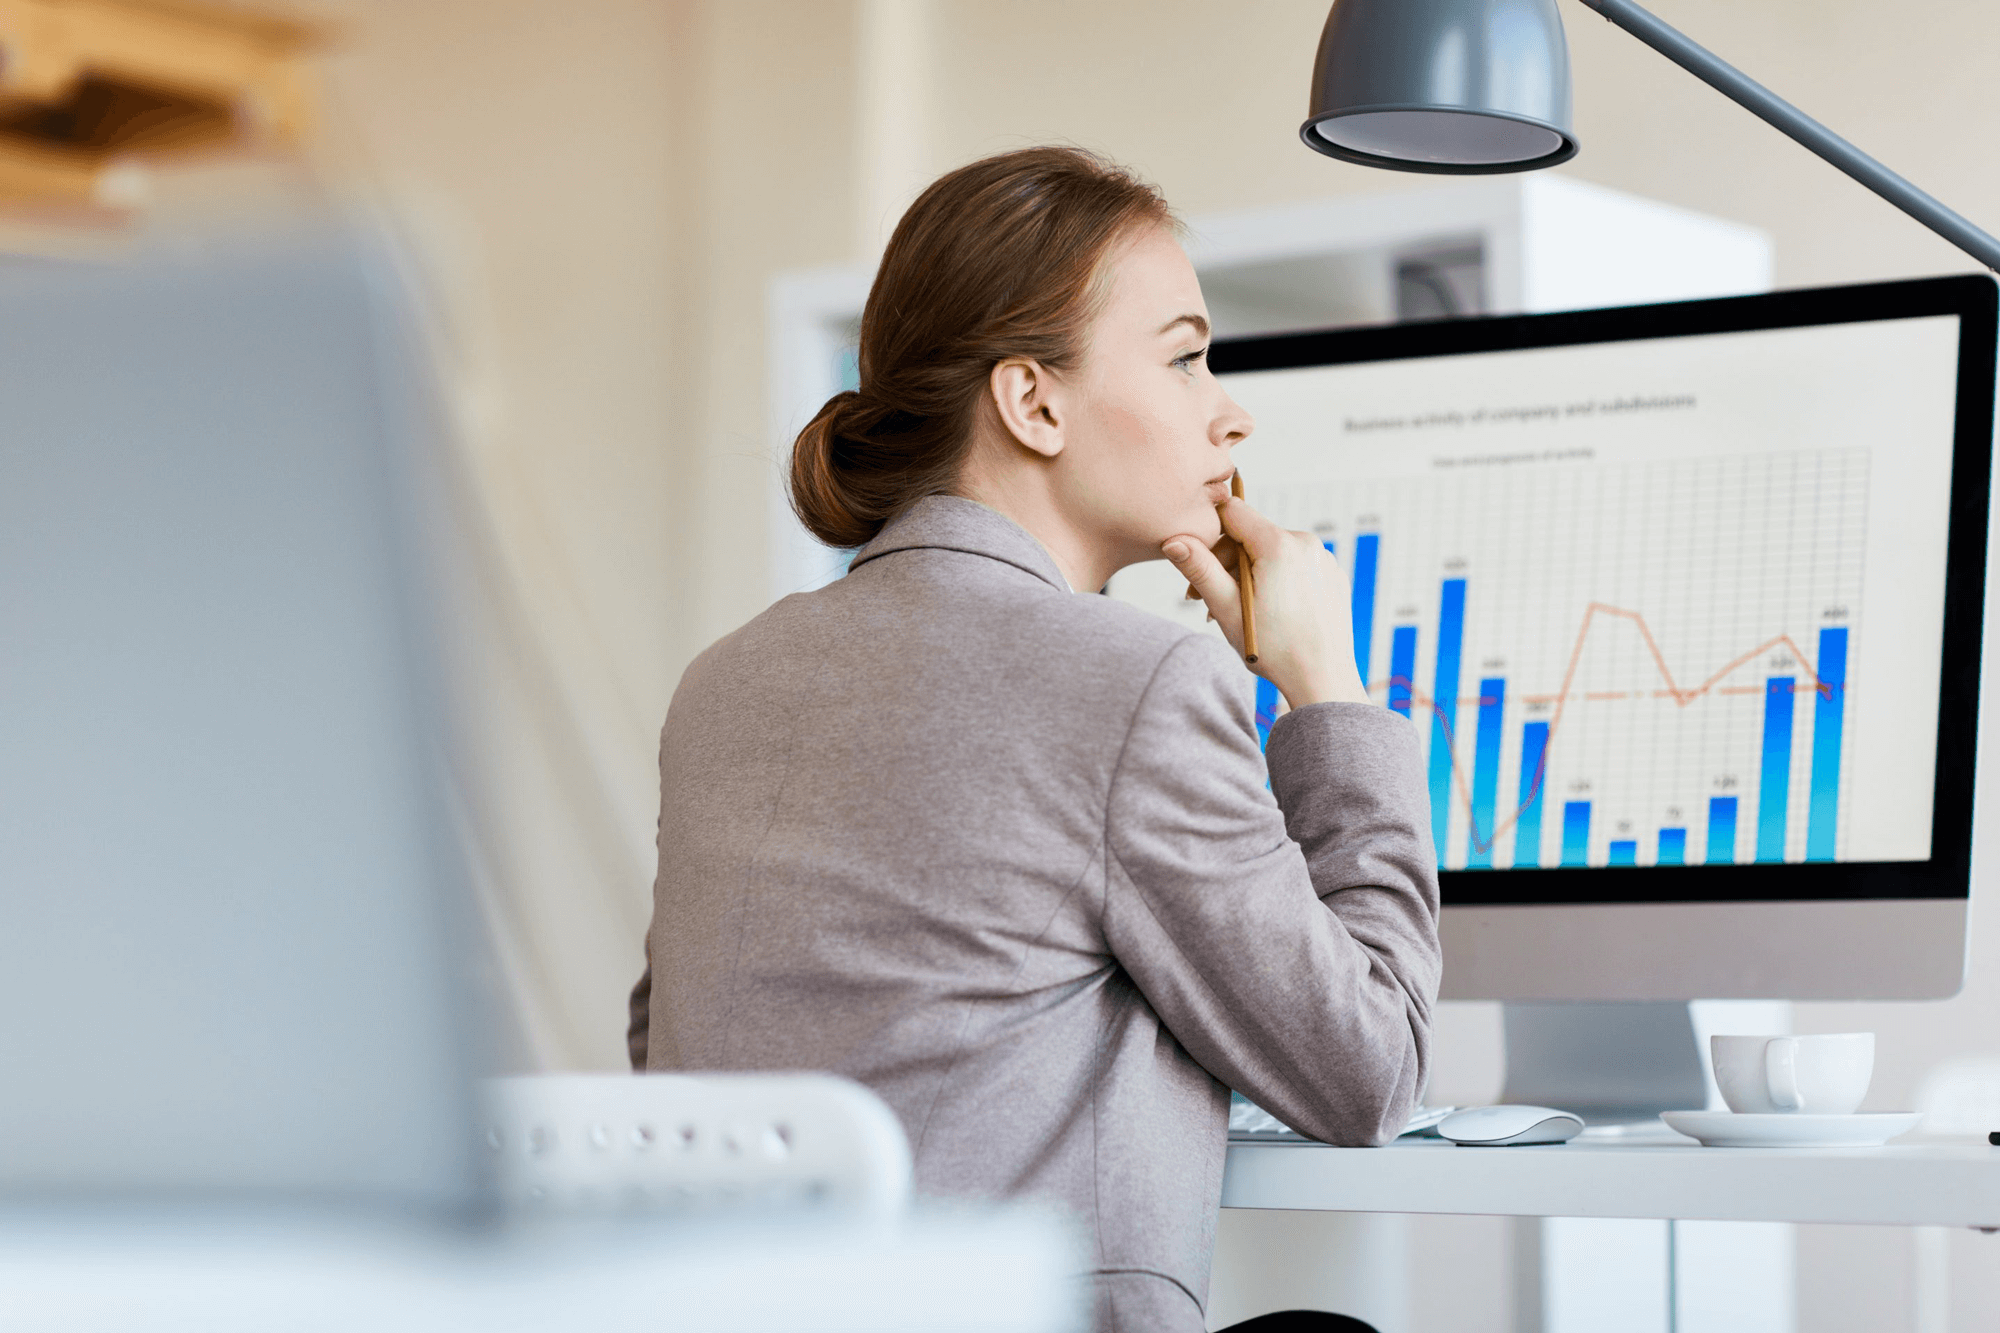 Analytics fixation | Focus not only on data analytics